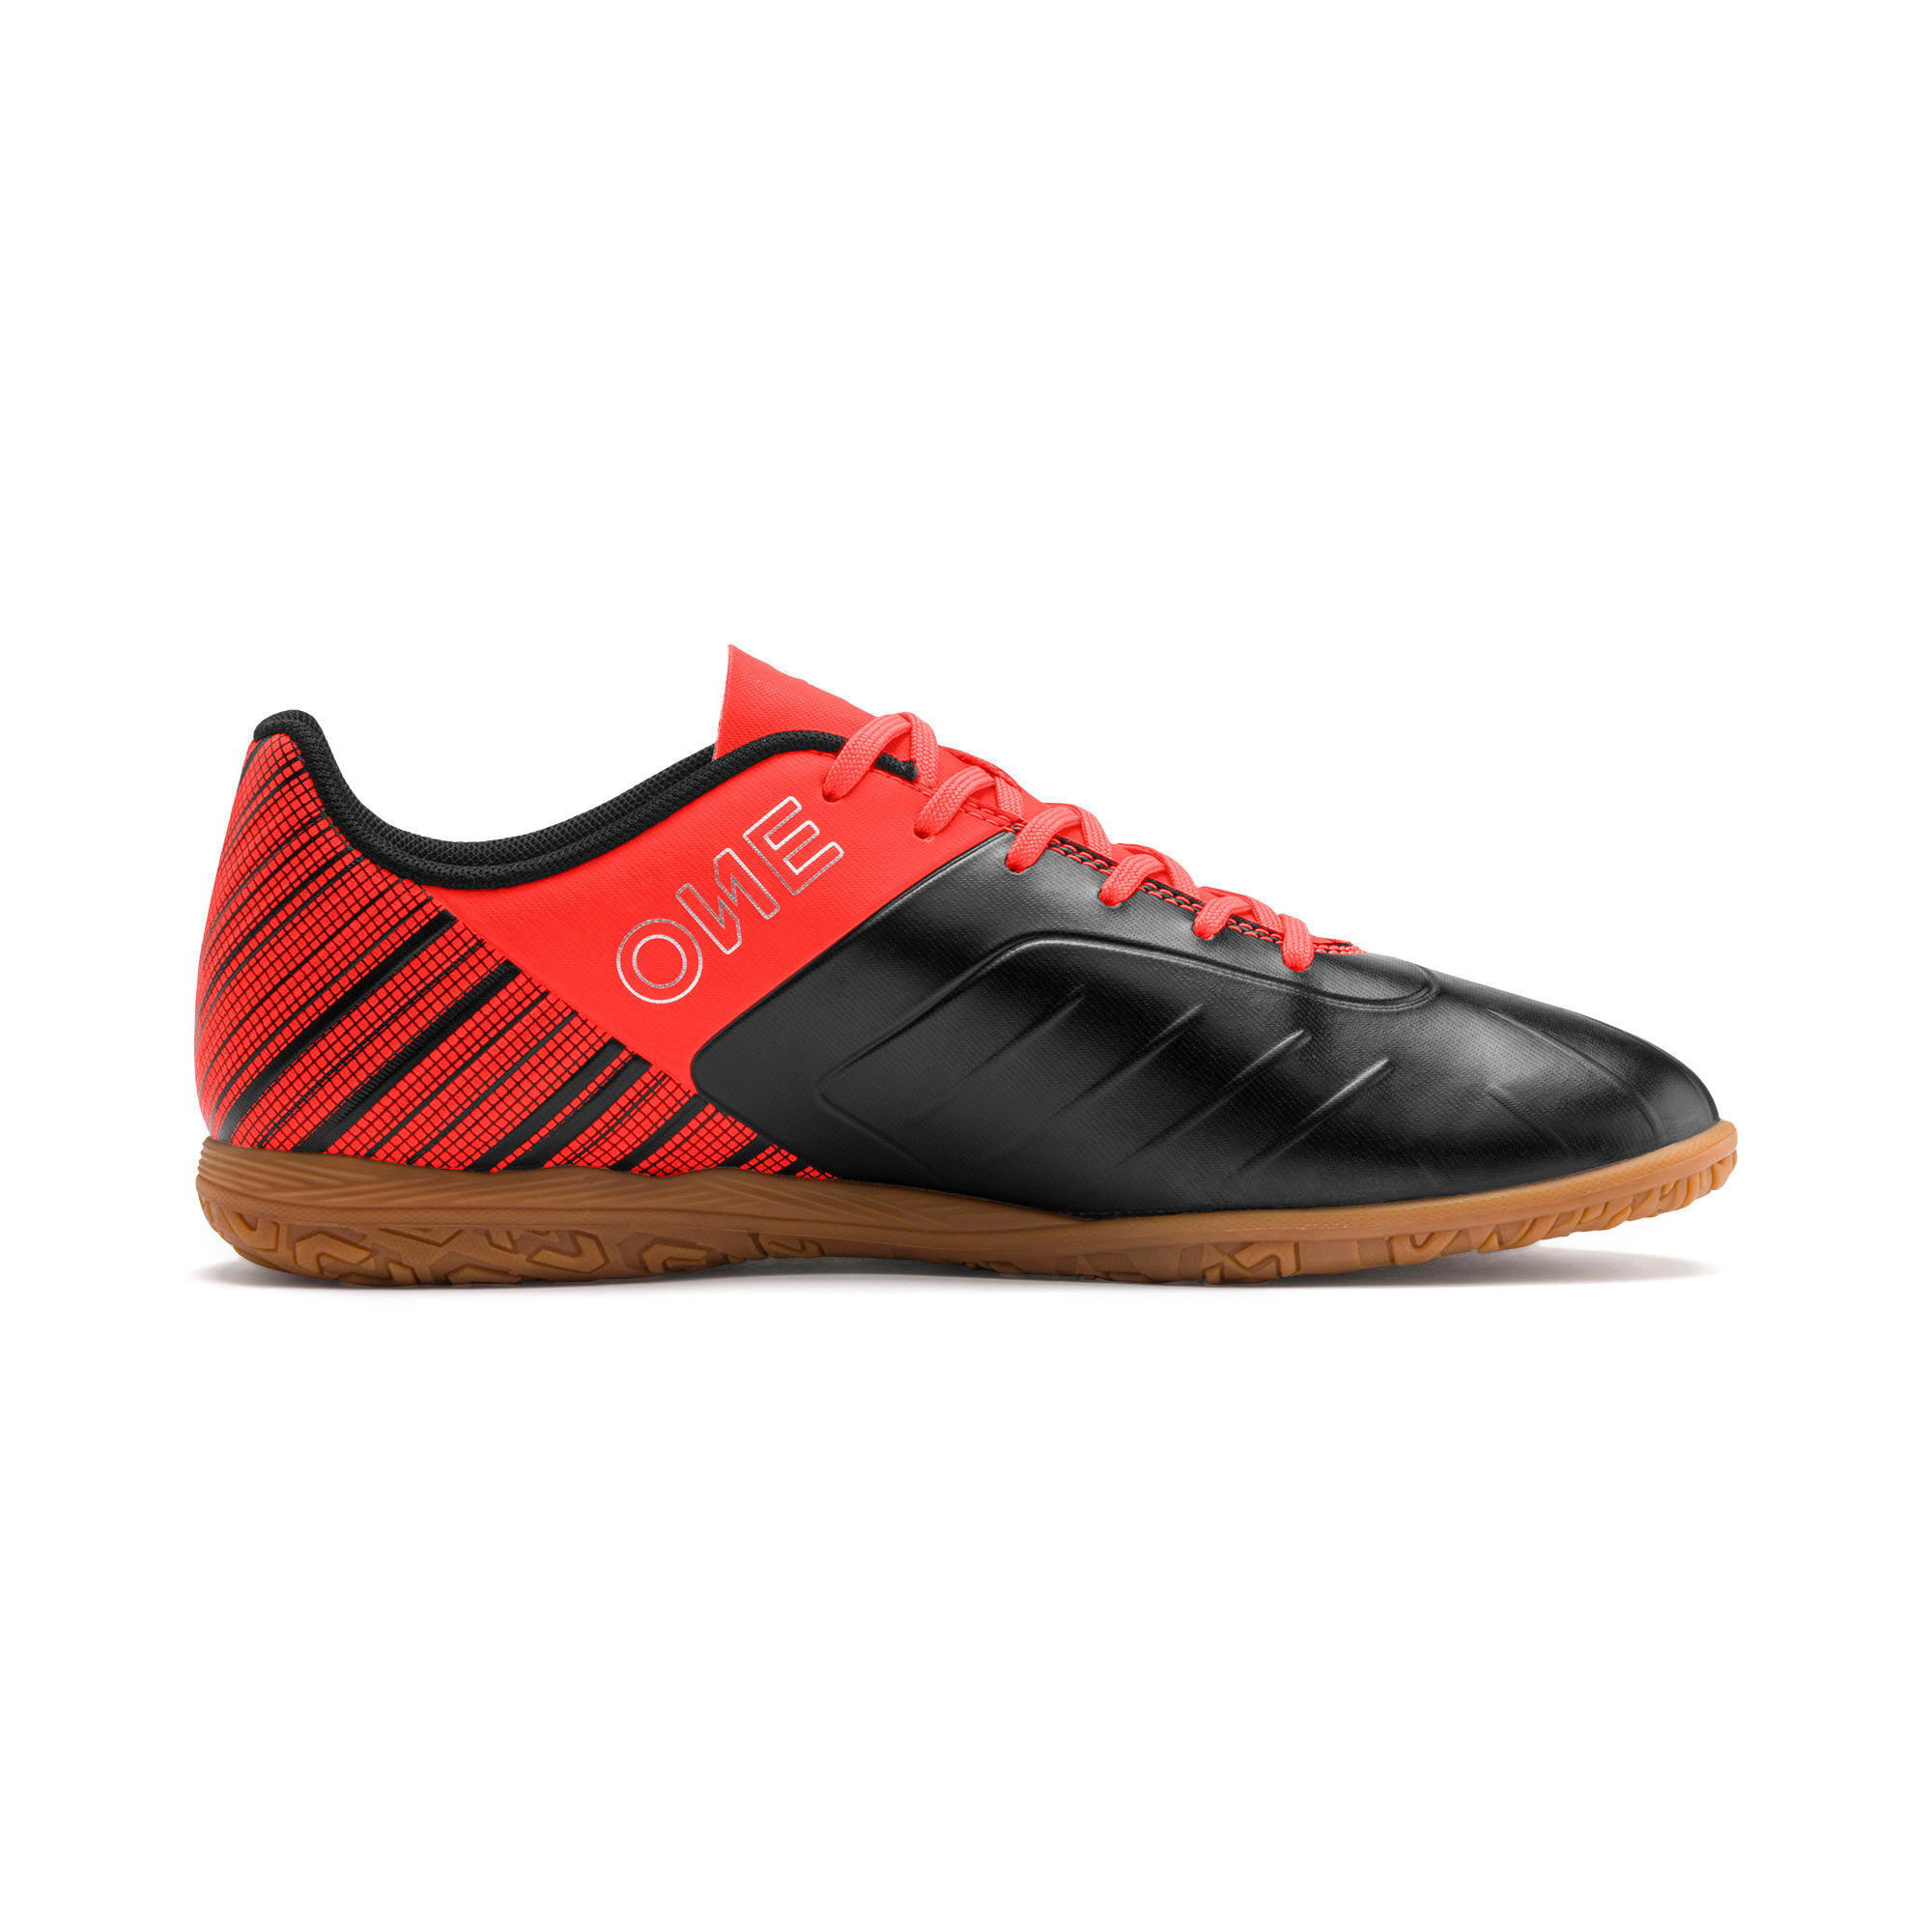 Thumbnail 6 of PUMA ONE 5.4 IT Men's Soccer Shoes, Black-Red-Silver-Gum, medium